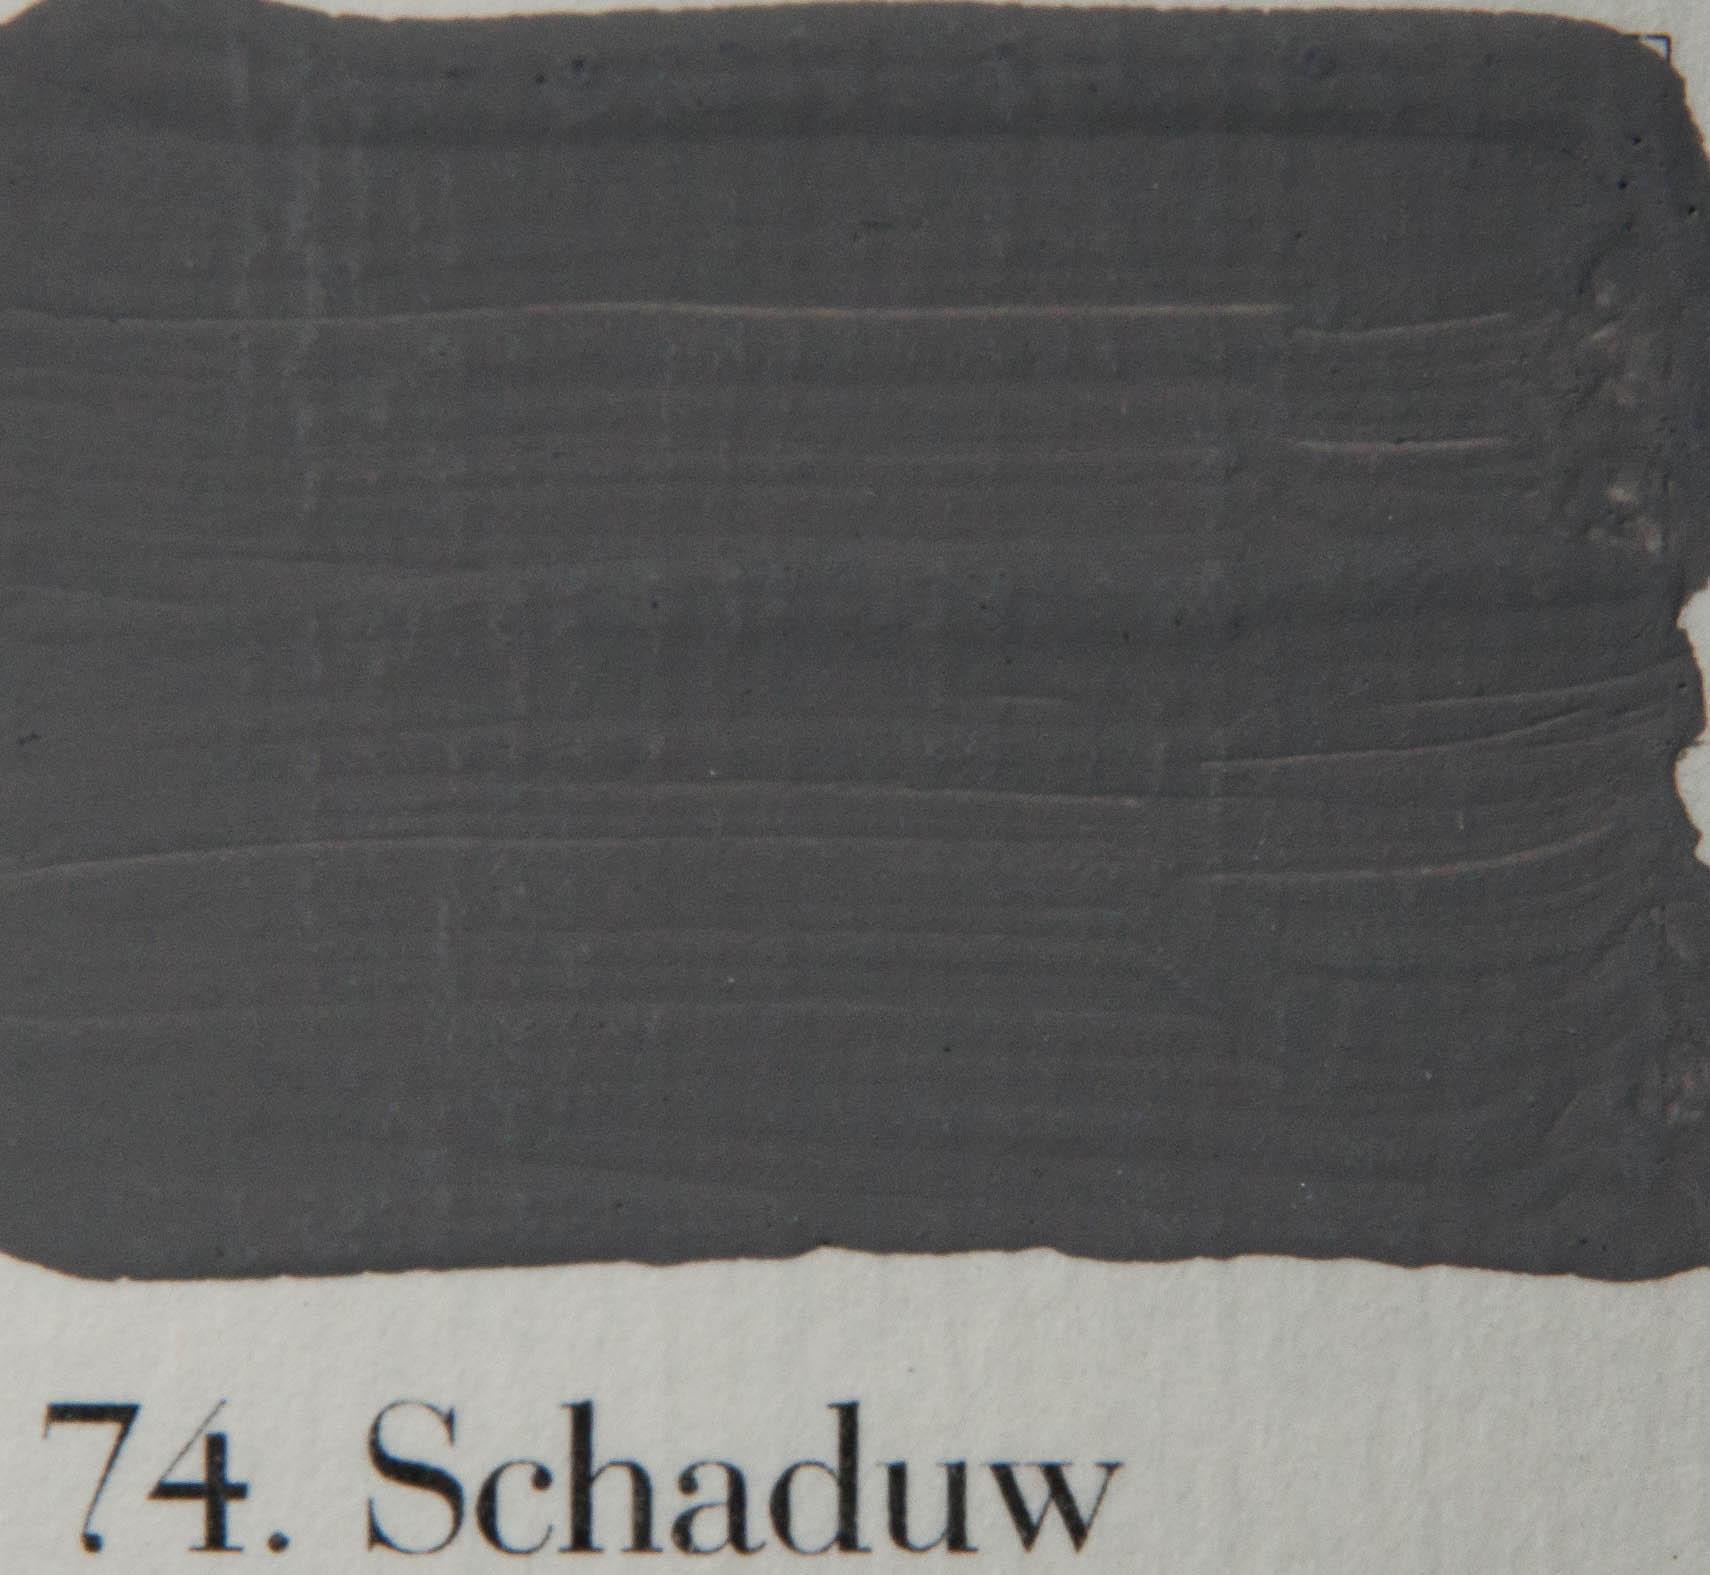 'l Authentique krijtverf 74. Schaduw